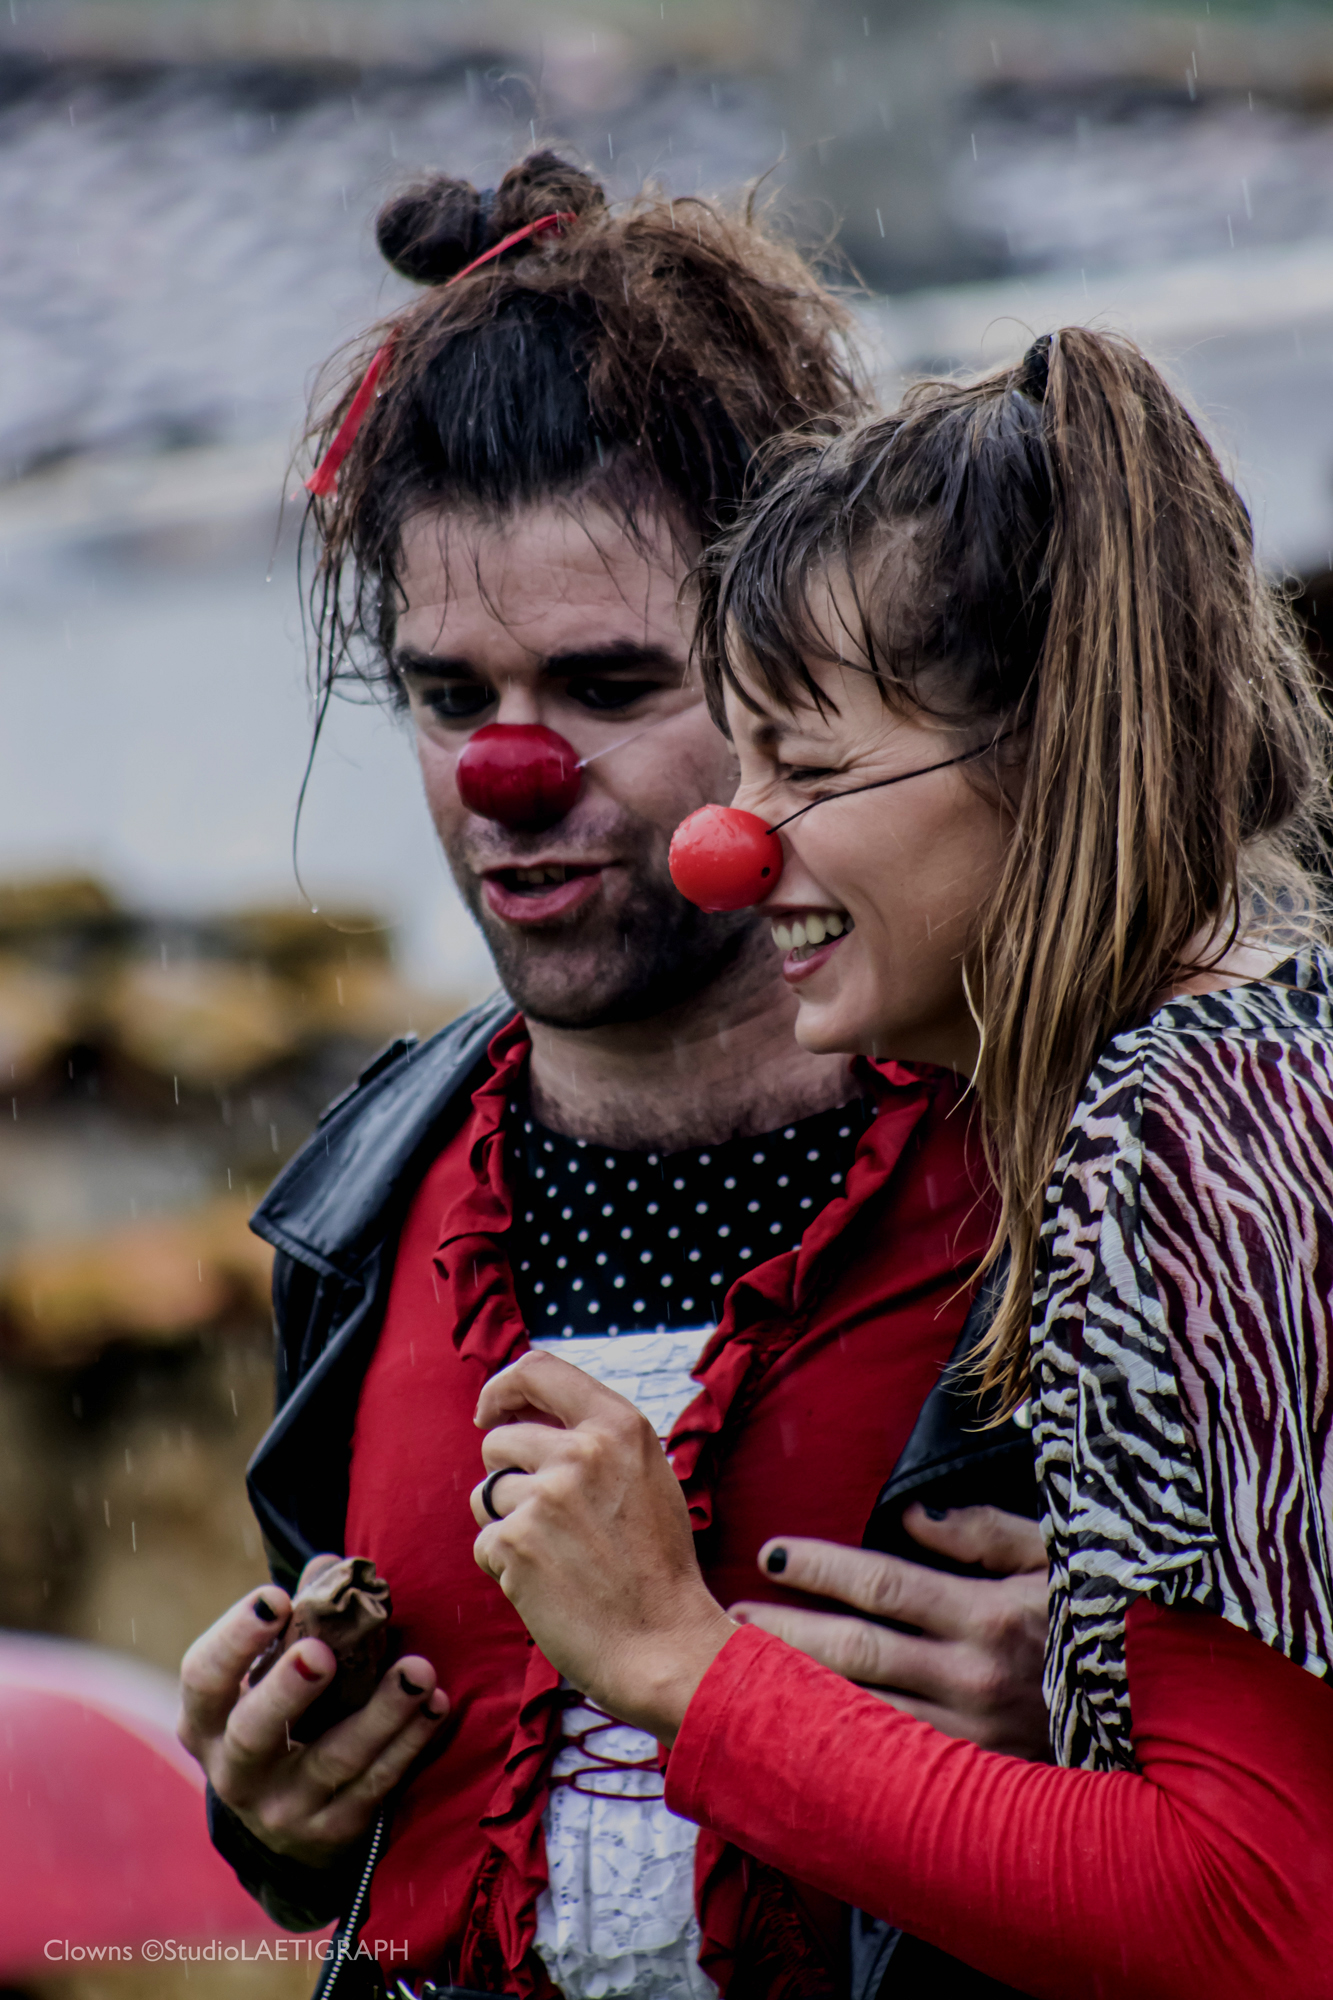 LMDCB21_clowns-34_1